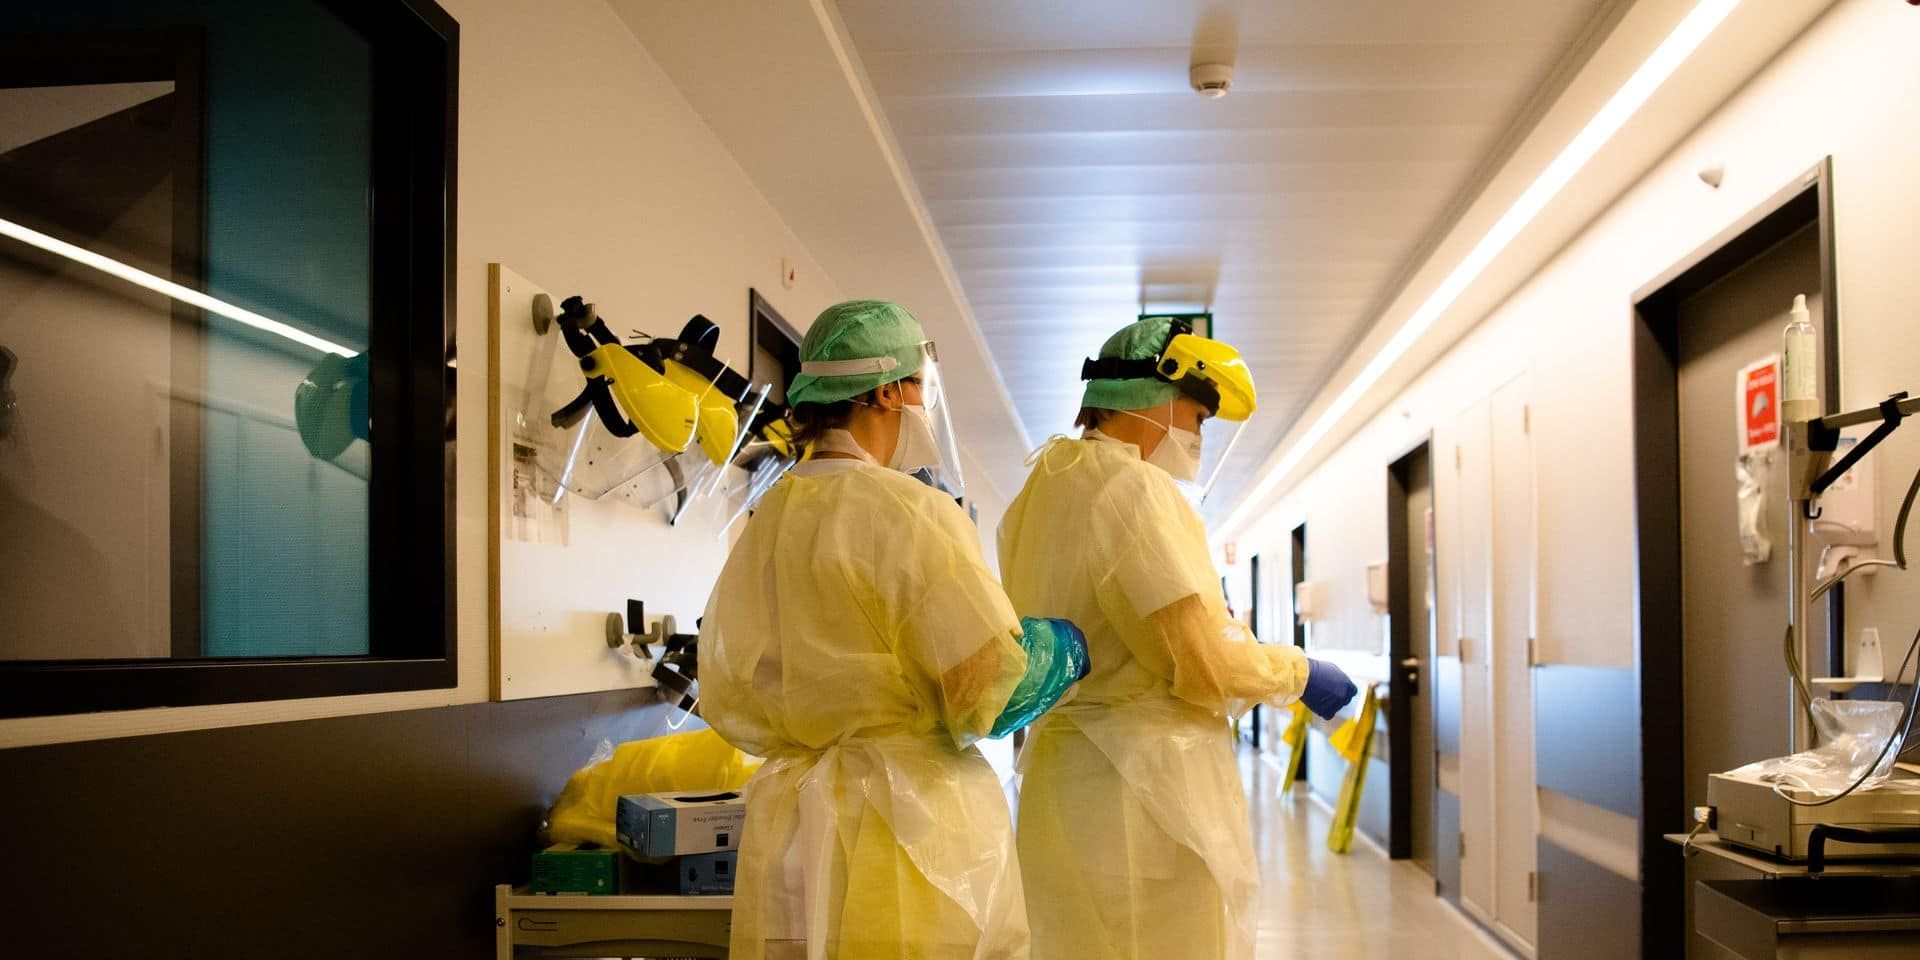 Lodelinsart - Charleroi - ISPPC - Hopital Civil Marie Curie: SARS-CoV-2 - Coronavirus - COVID-19